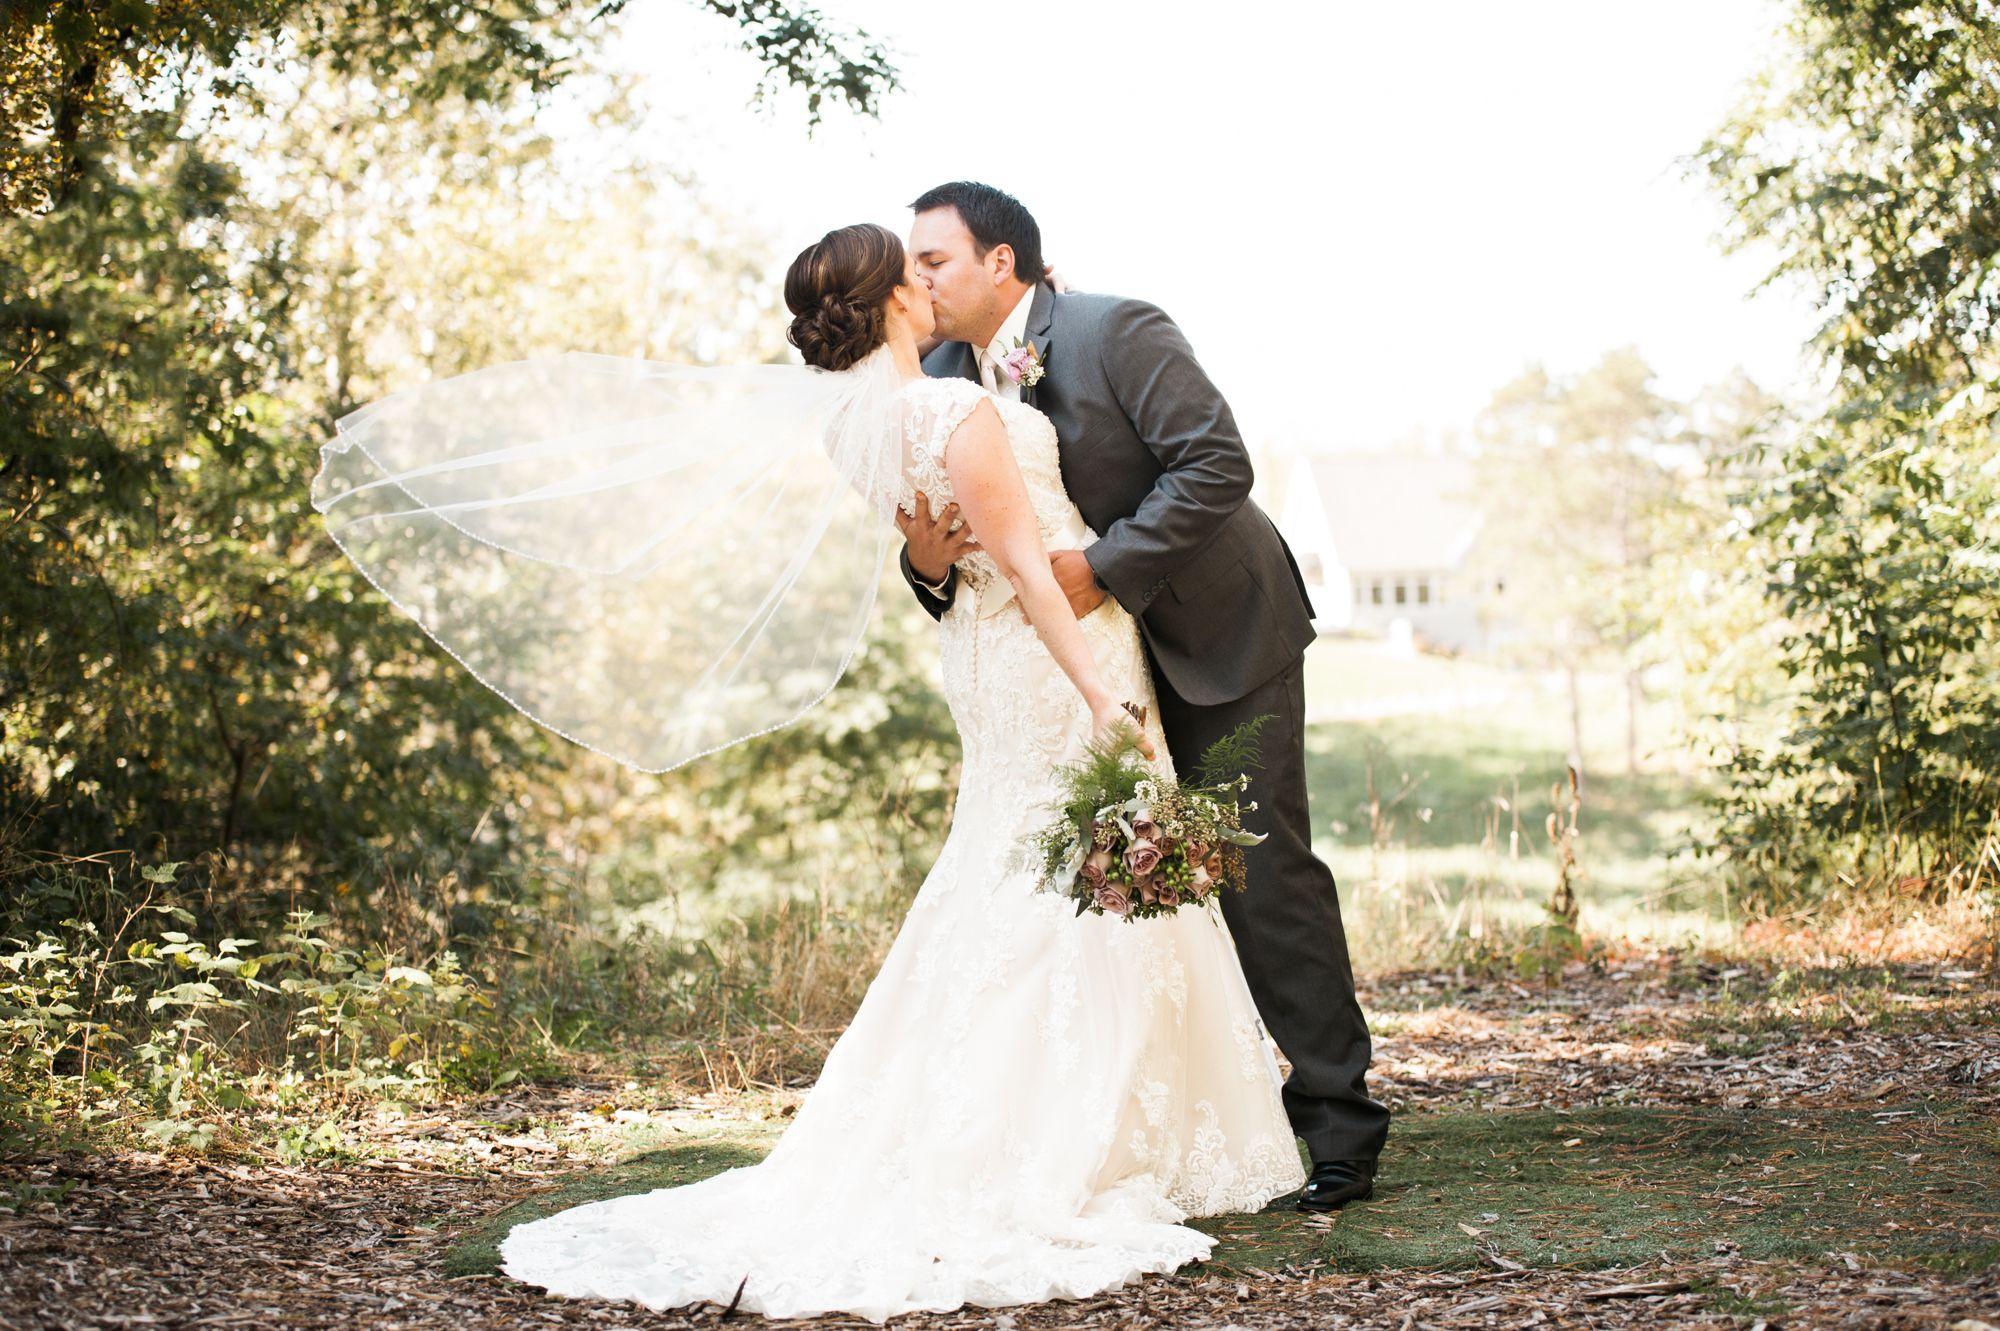 Minnesota Wedding Photography I MN Wedding Photos I Golf Course ...